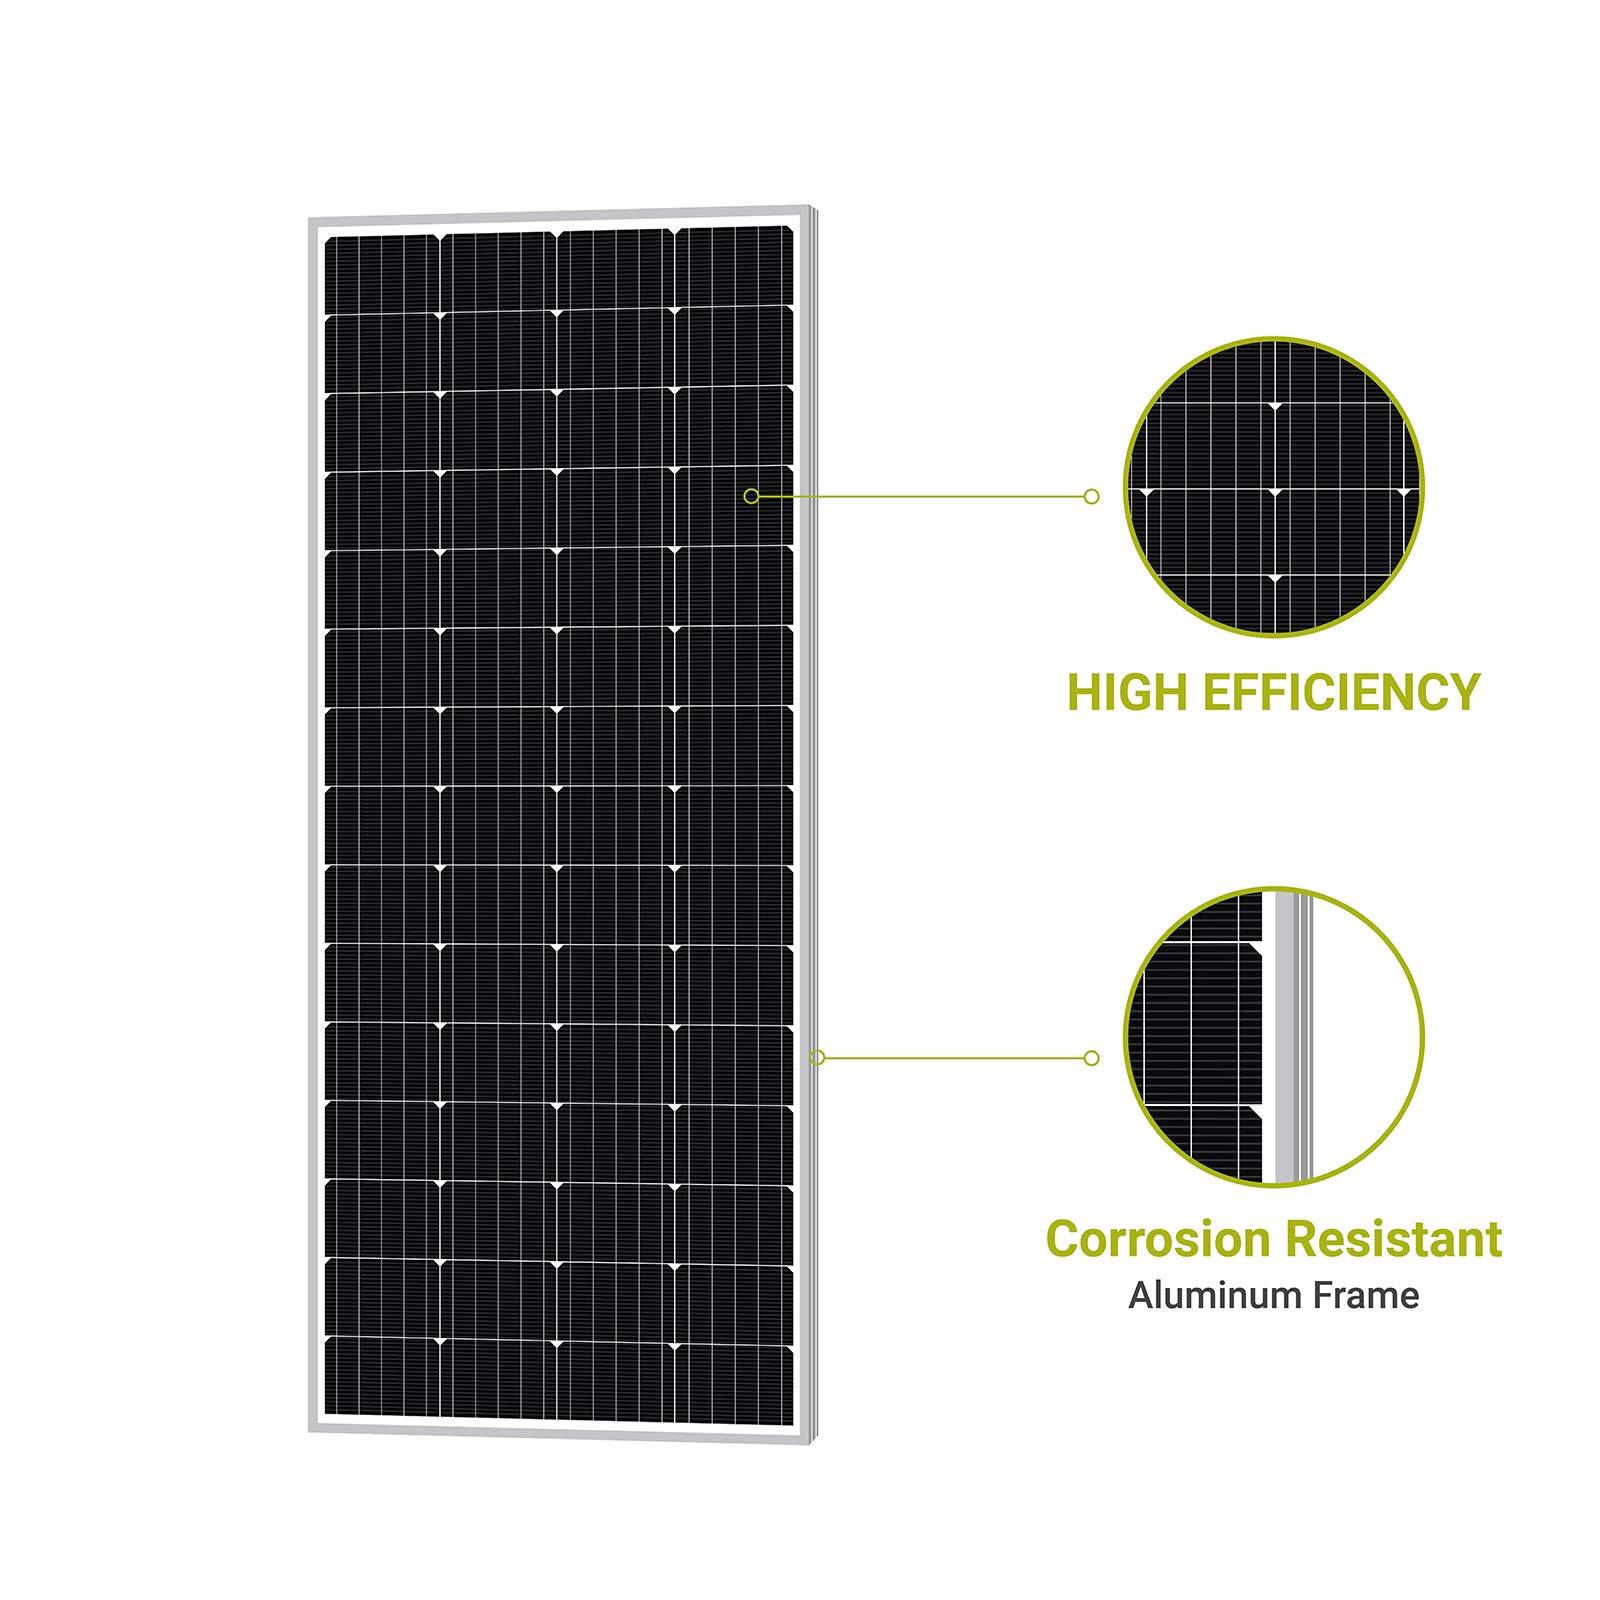 Newpowa 200W Monocrystalline 200 Watt 12V Solar Panel High Efficiency Mono PV Module Power for RV Marine Boat Cabin or Other Off Grid System